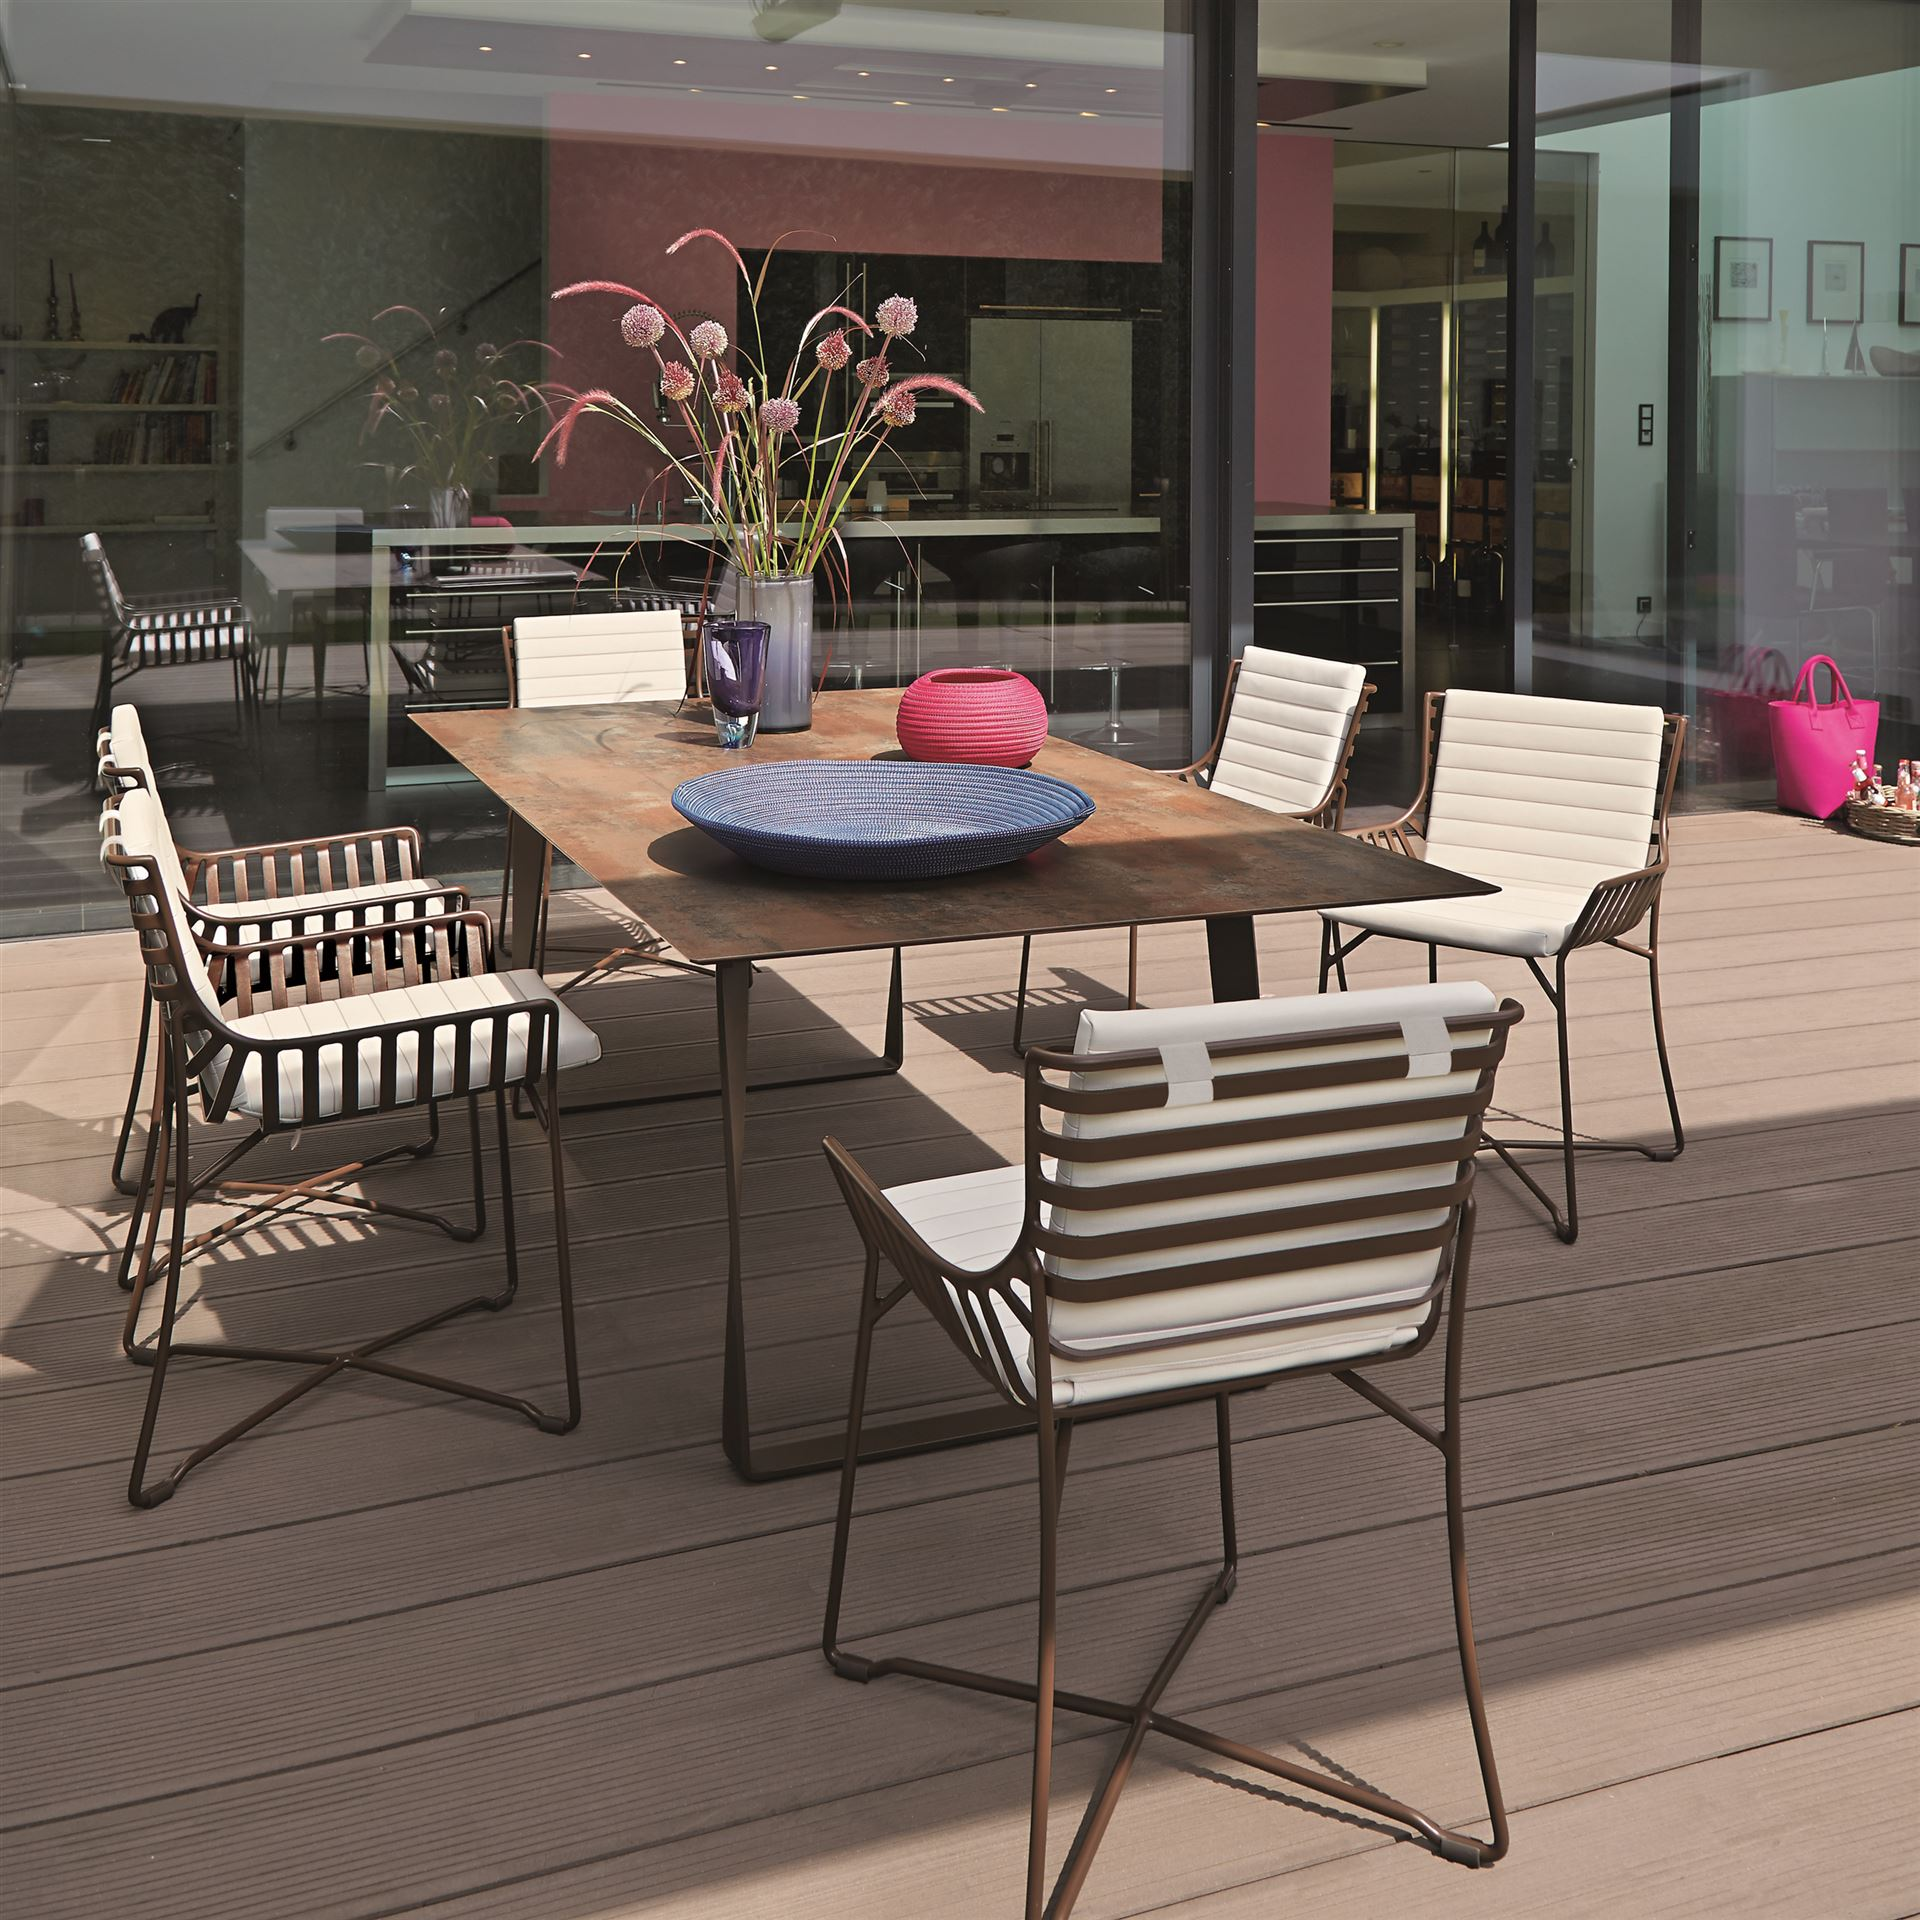 terrassengarten graz wien linz budapest. Black Bedroom Furniture Sets. Home Design Ideas